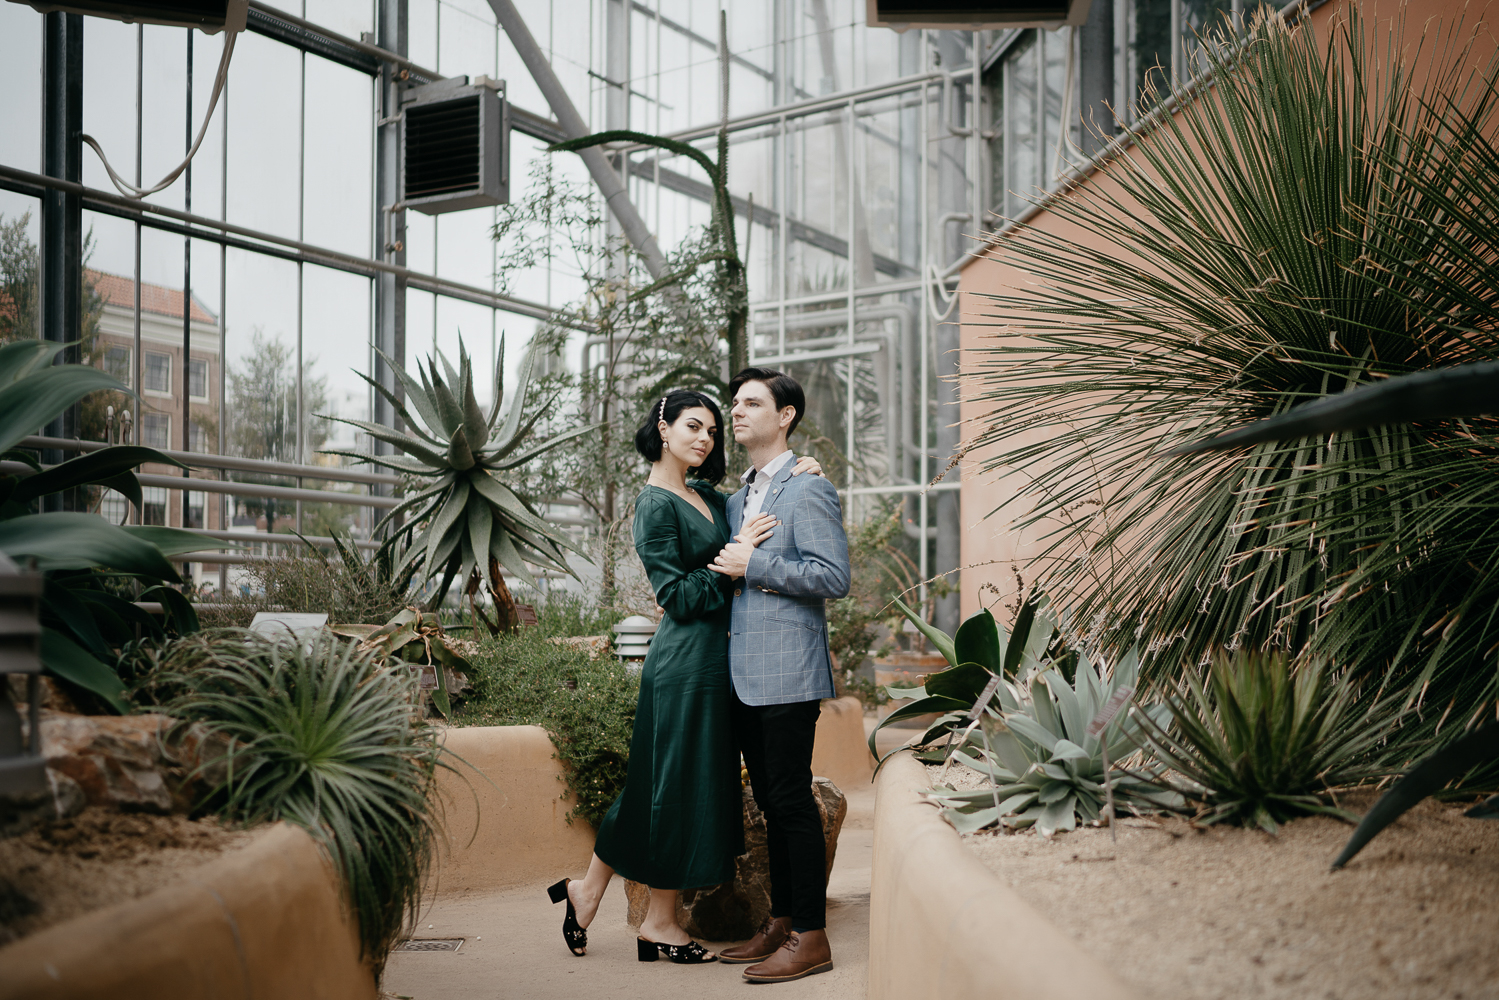 photoshoot botanical garden amsterdam couple photographer mark hadden